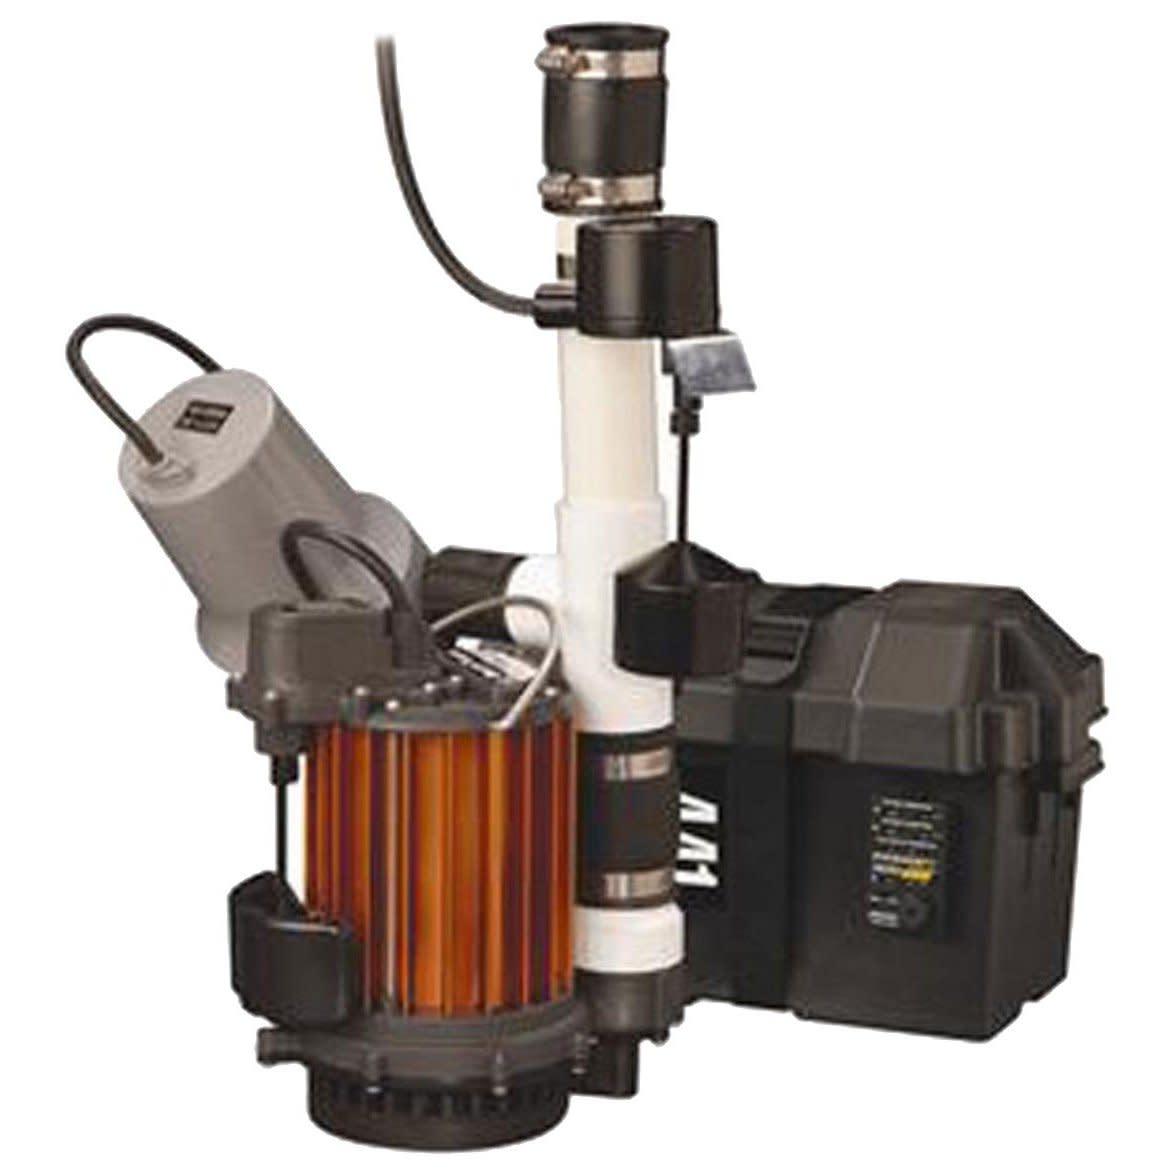 Liberty Pumps PC257-441 1/3-Horse Power PC-Series Sump Pump